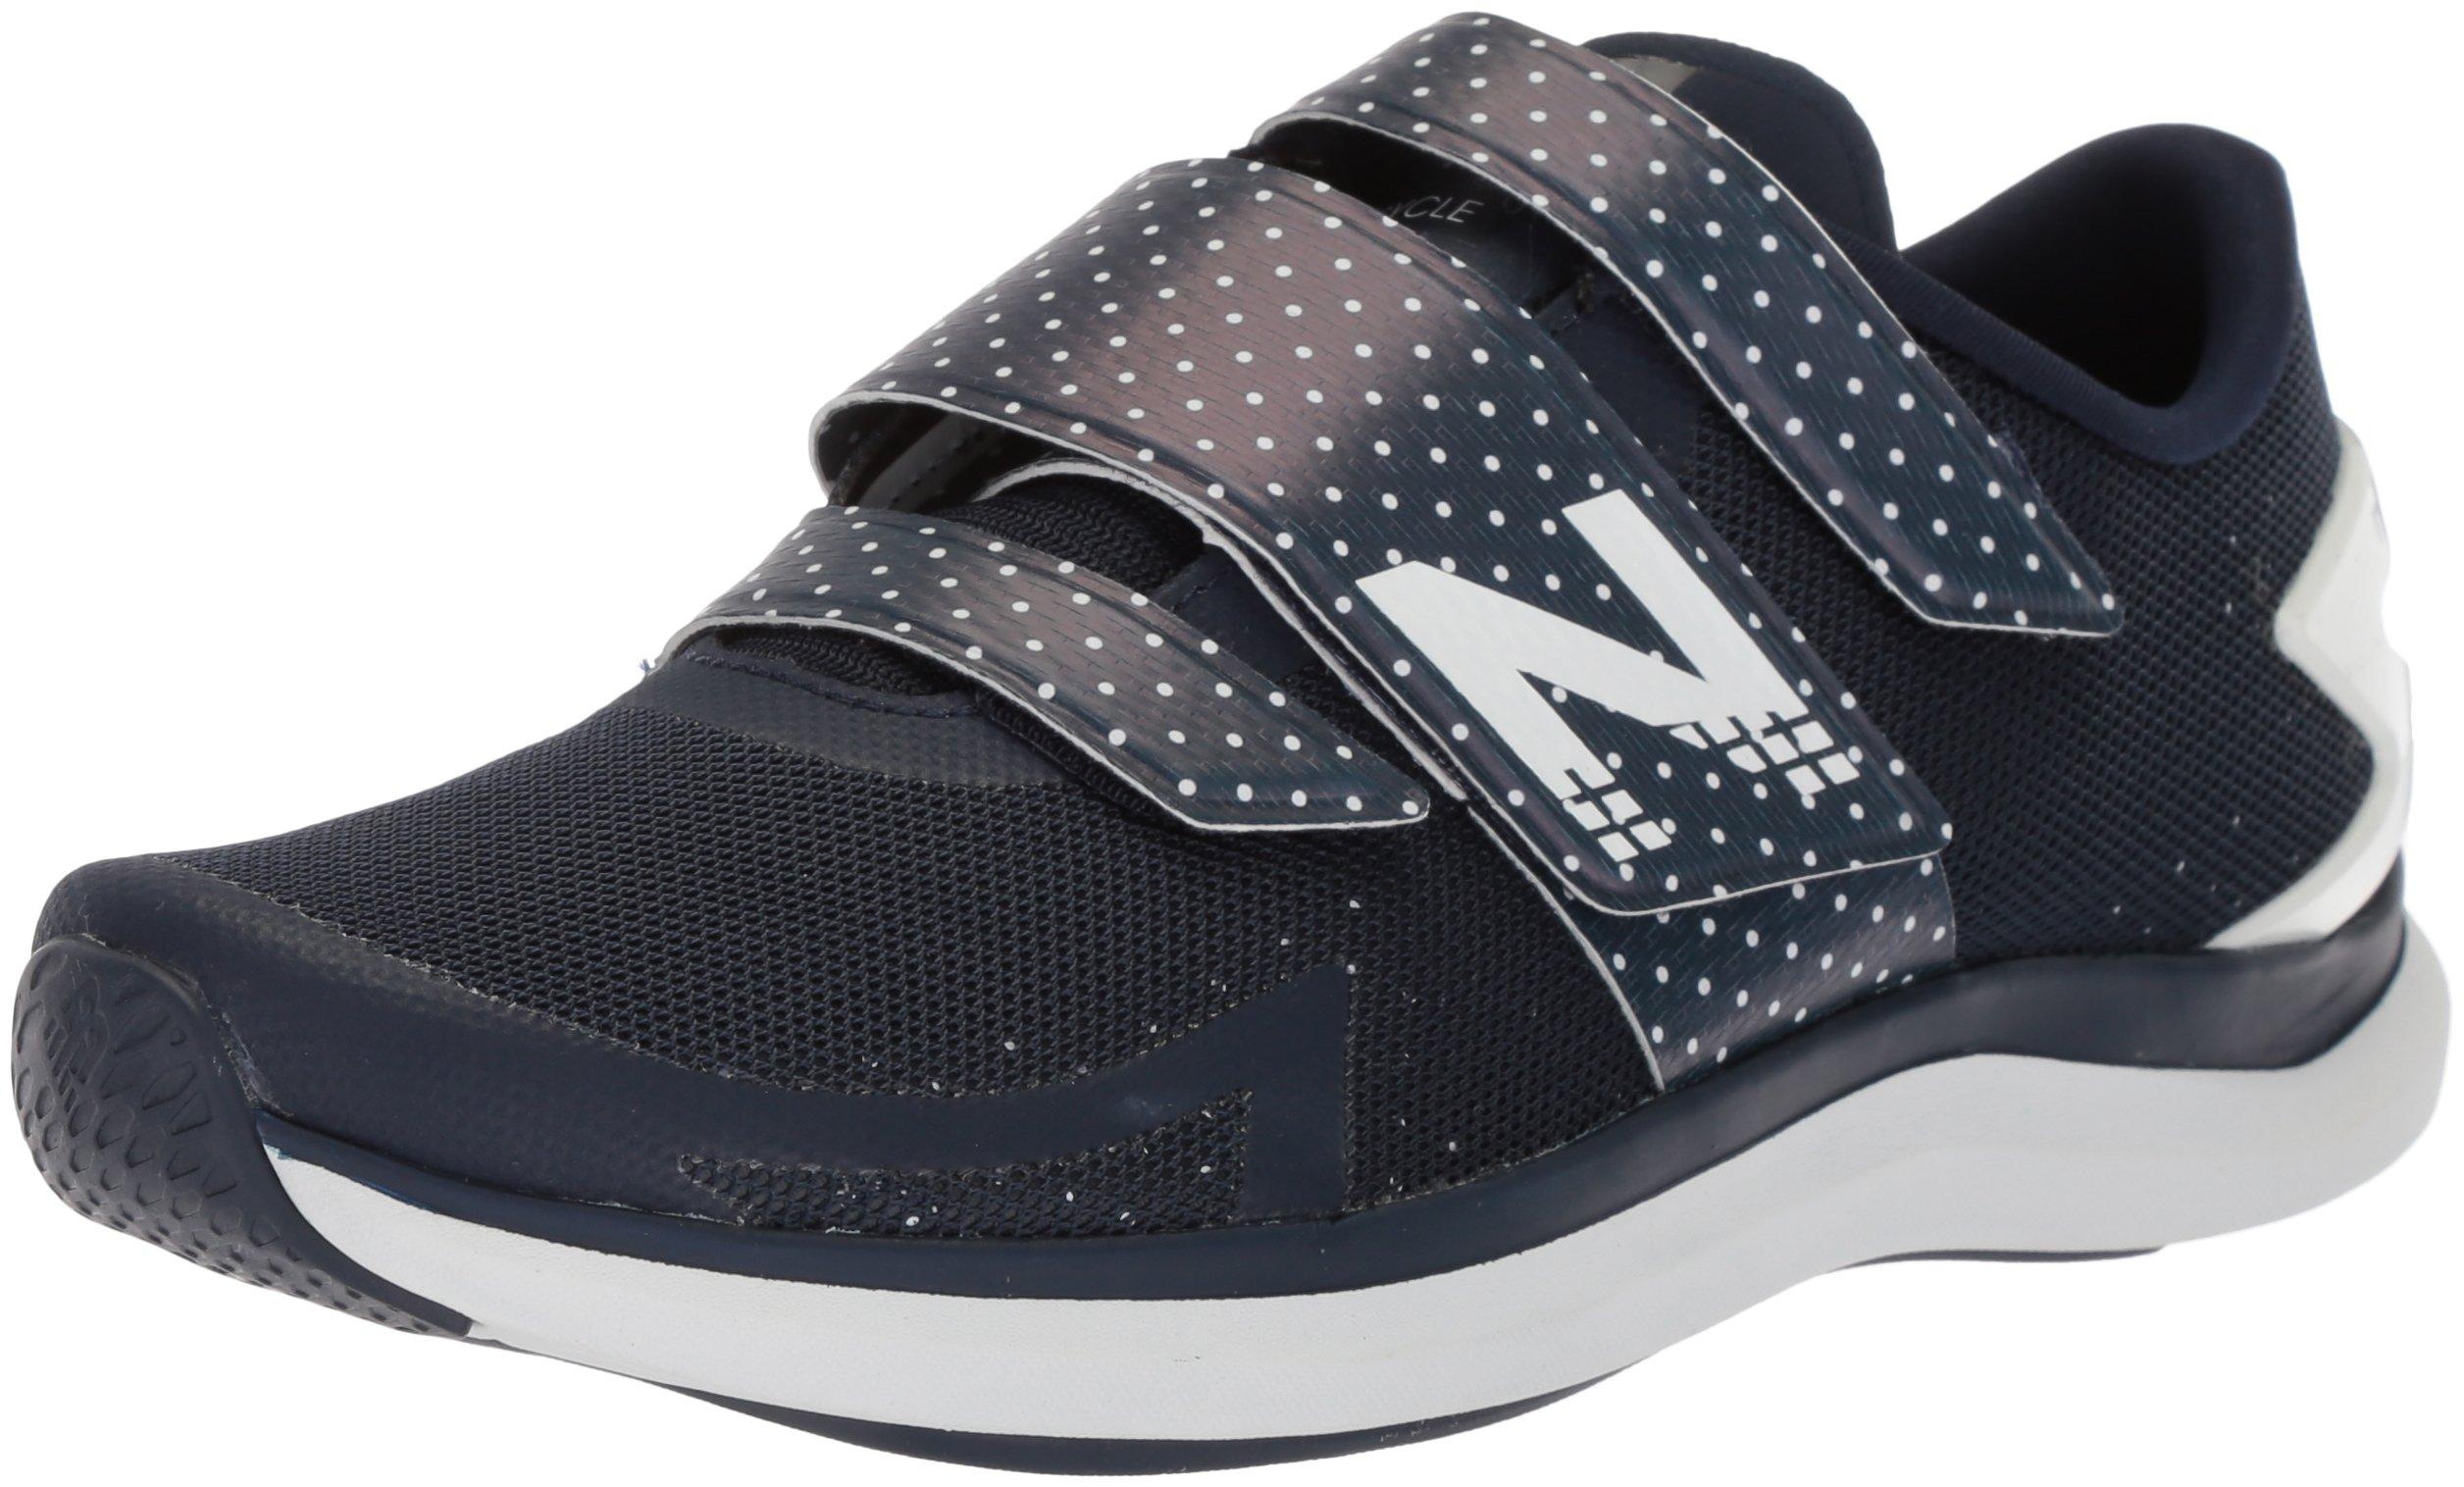 New Balance Women's 09v1 Cross-Trainer-Shoes,pigment/white,5 B US